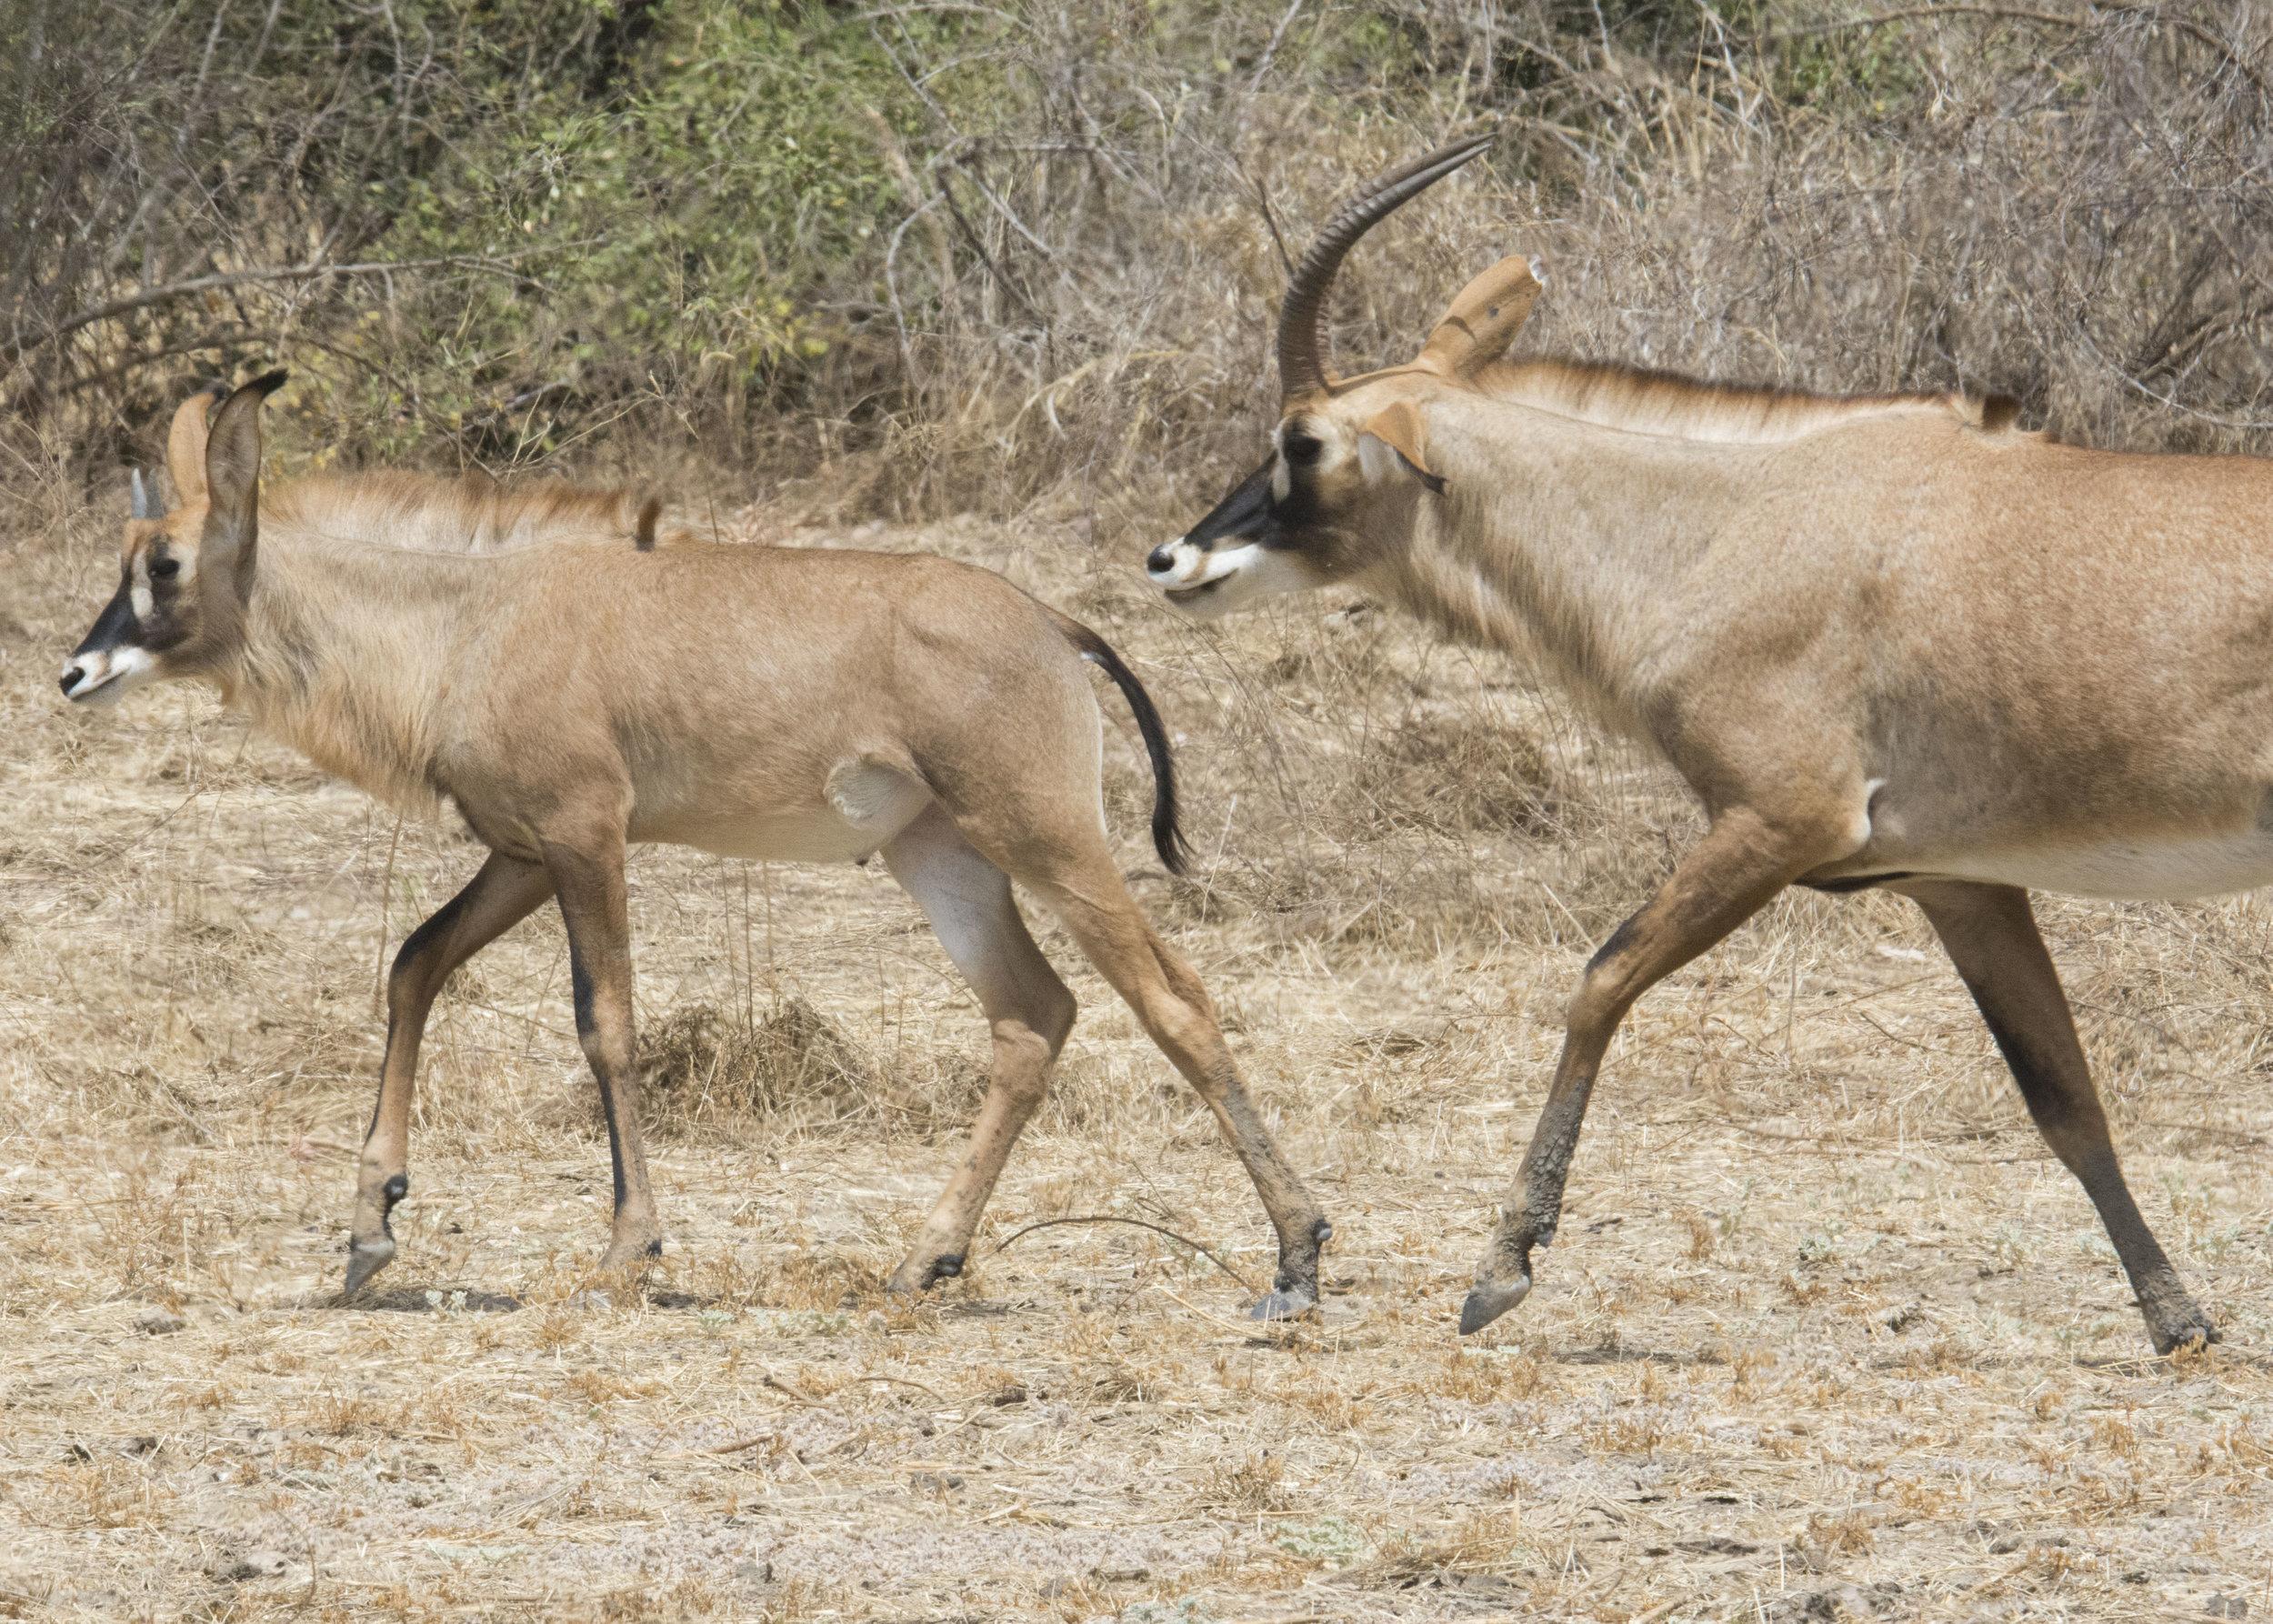 Roan antelope at Zakouma Park. Photography by Karoline Hood.